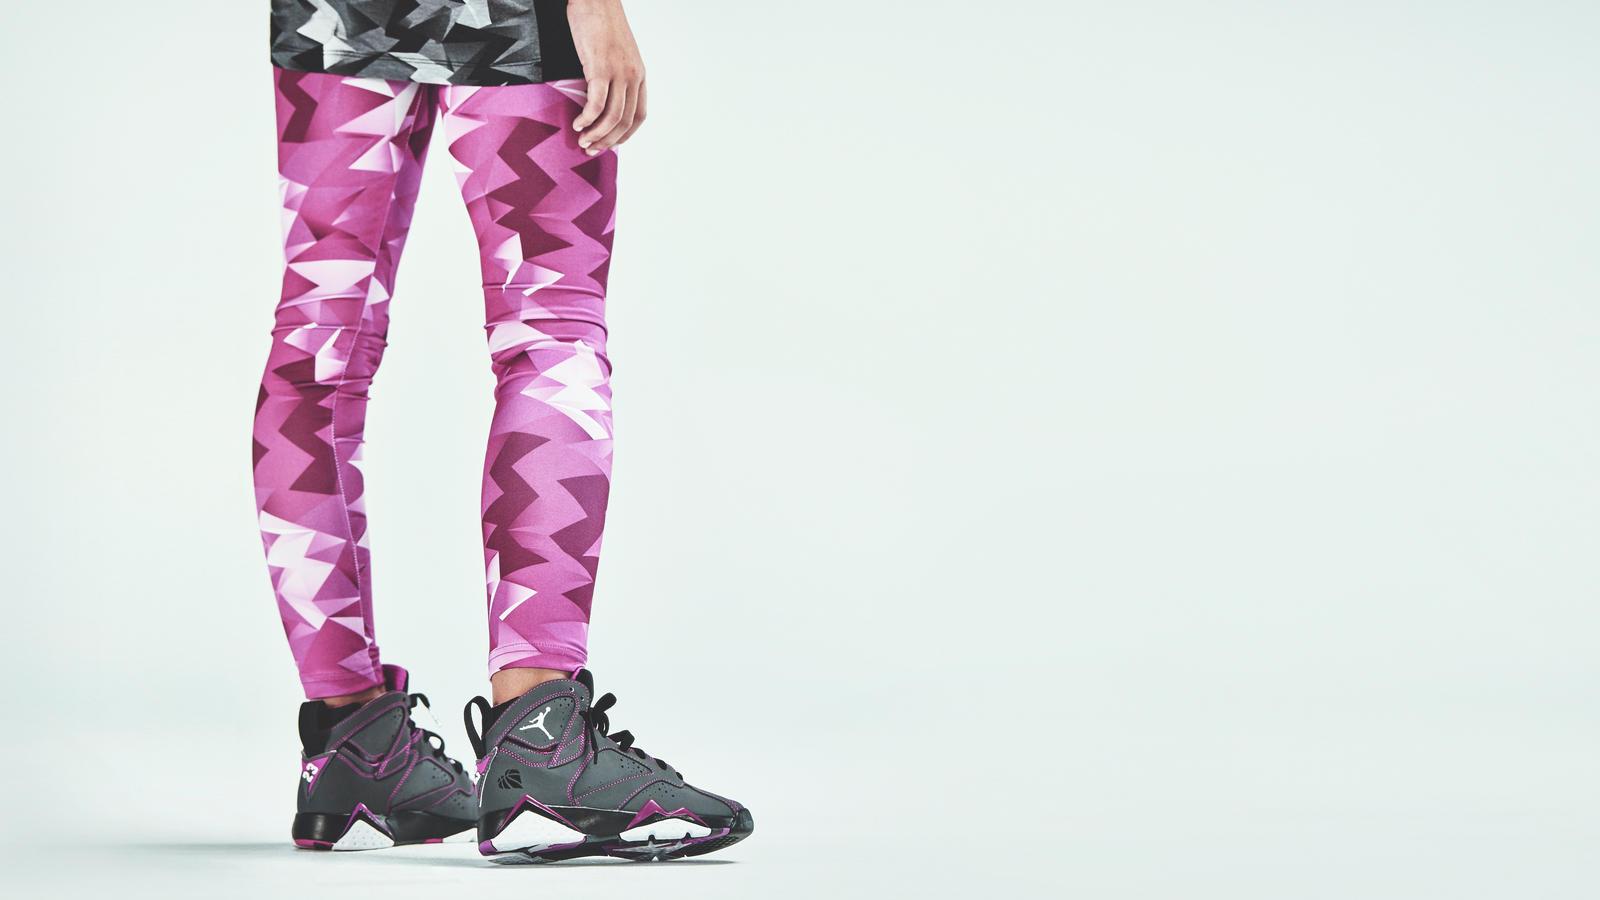 Jordan Brand expands Grade School